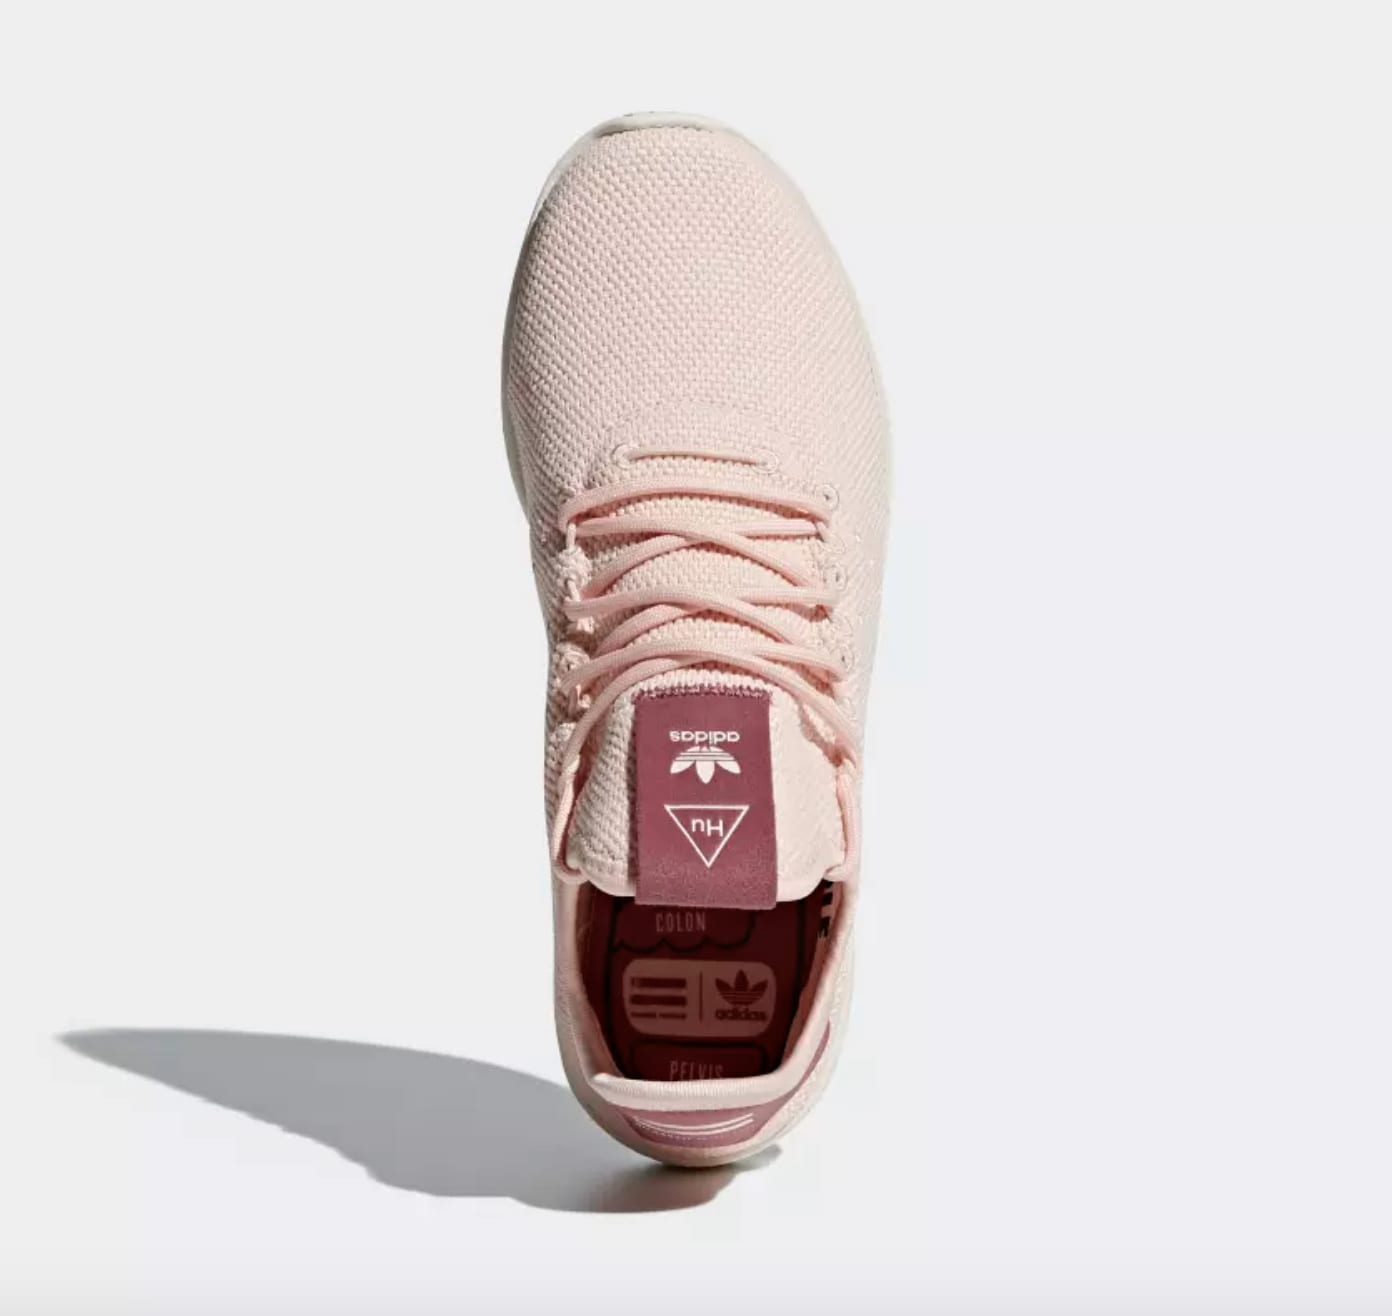 Pharrell x Adidas Tennis Hu AQ0988 (Top)